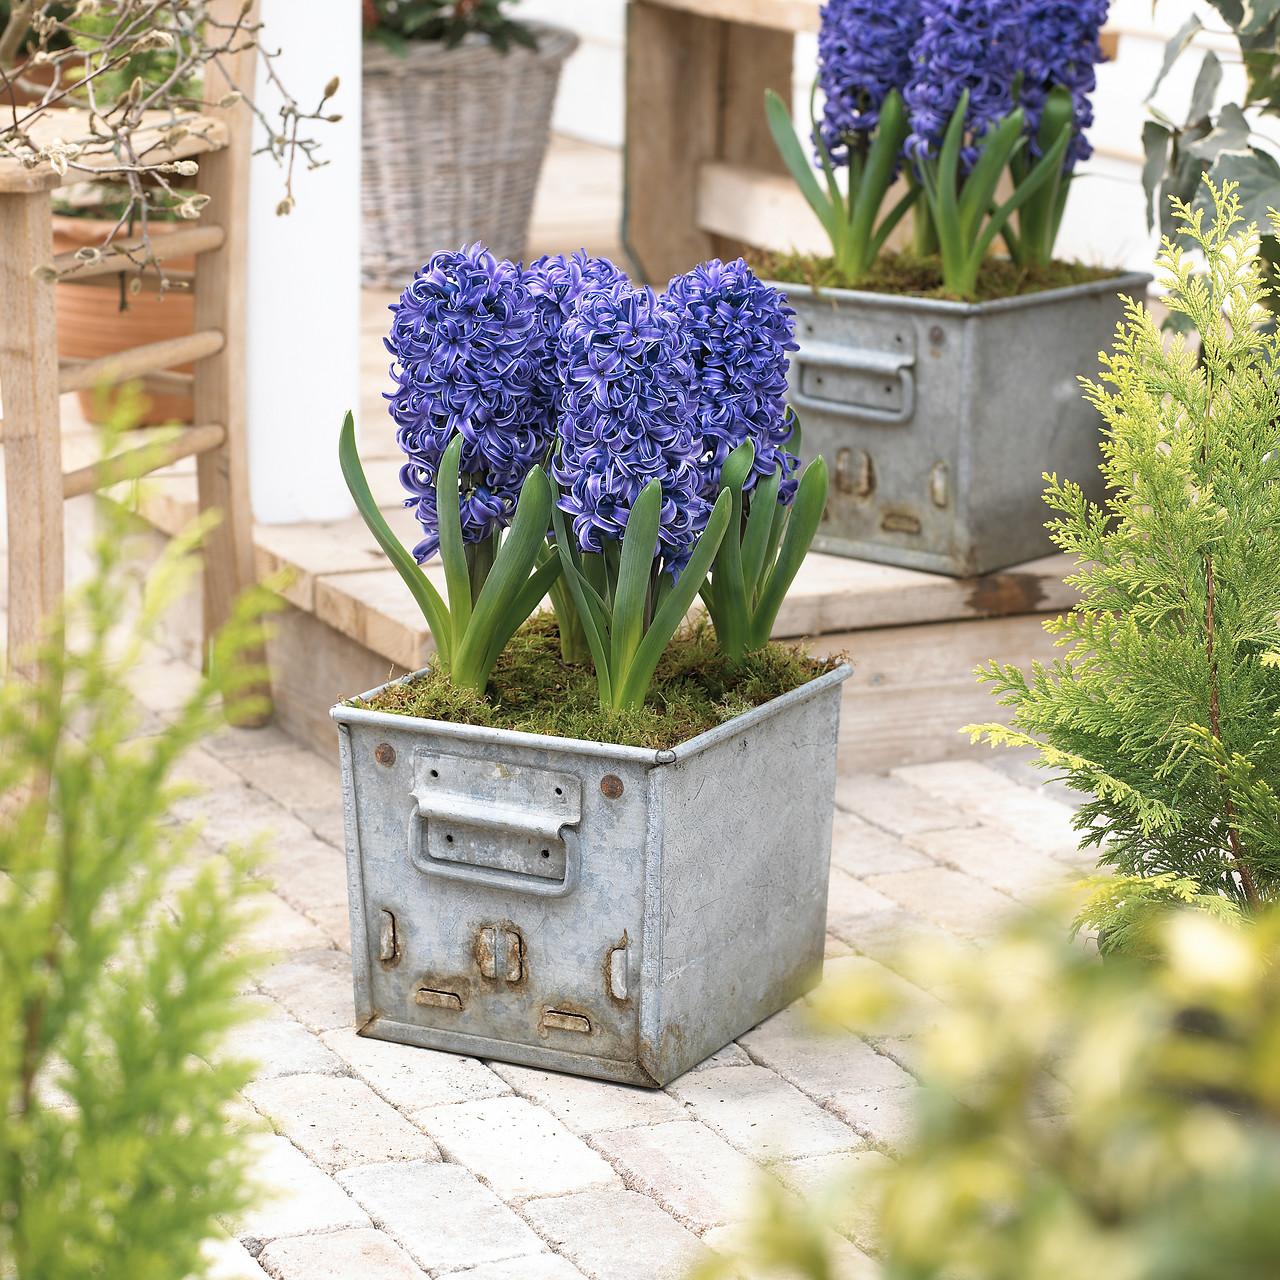 Flores de jacintos en maceta de metal